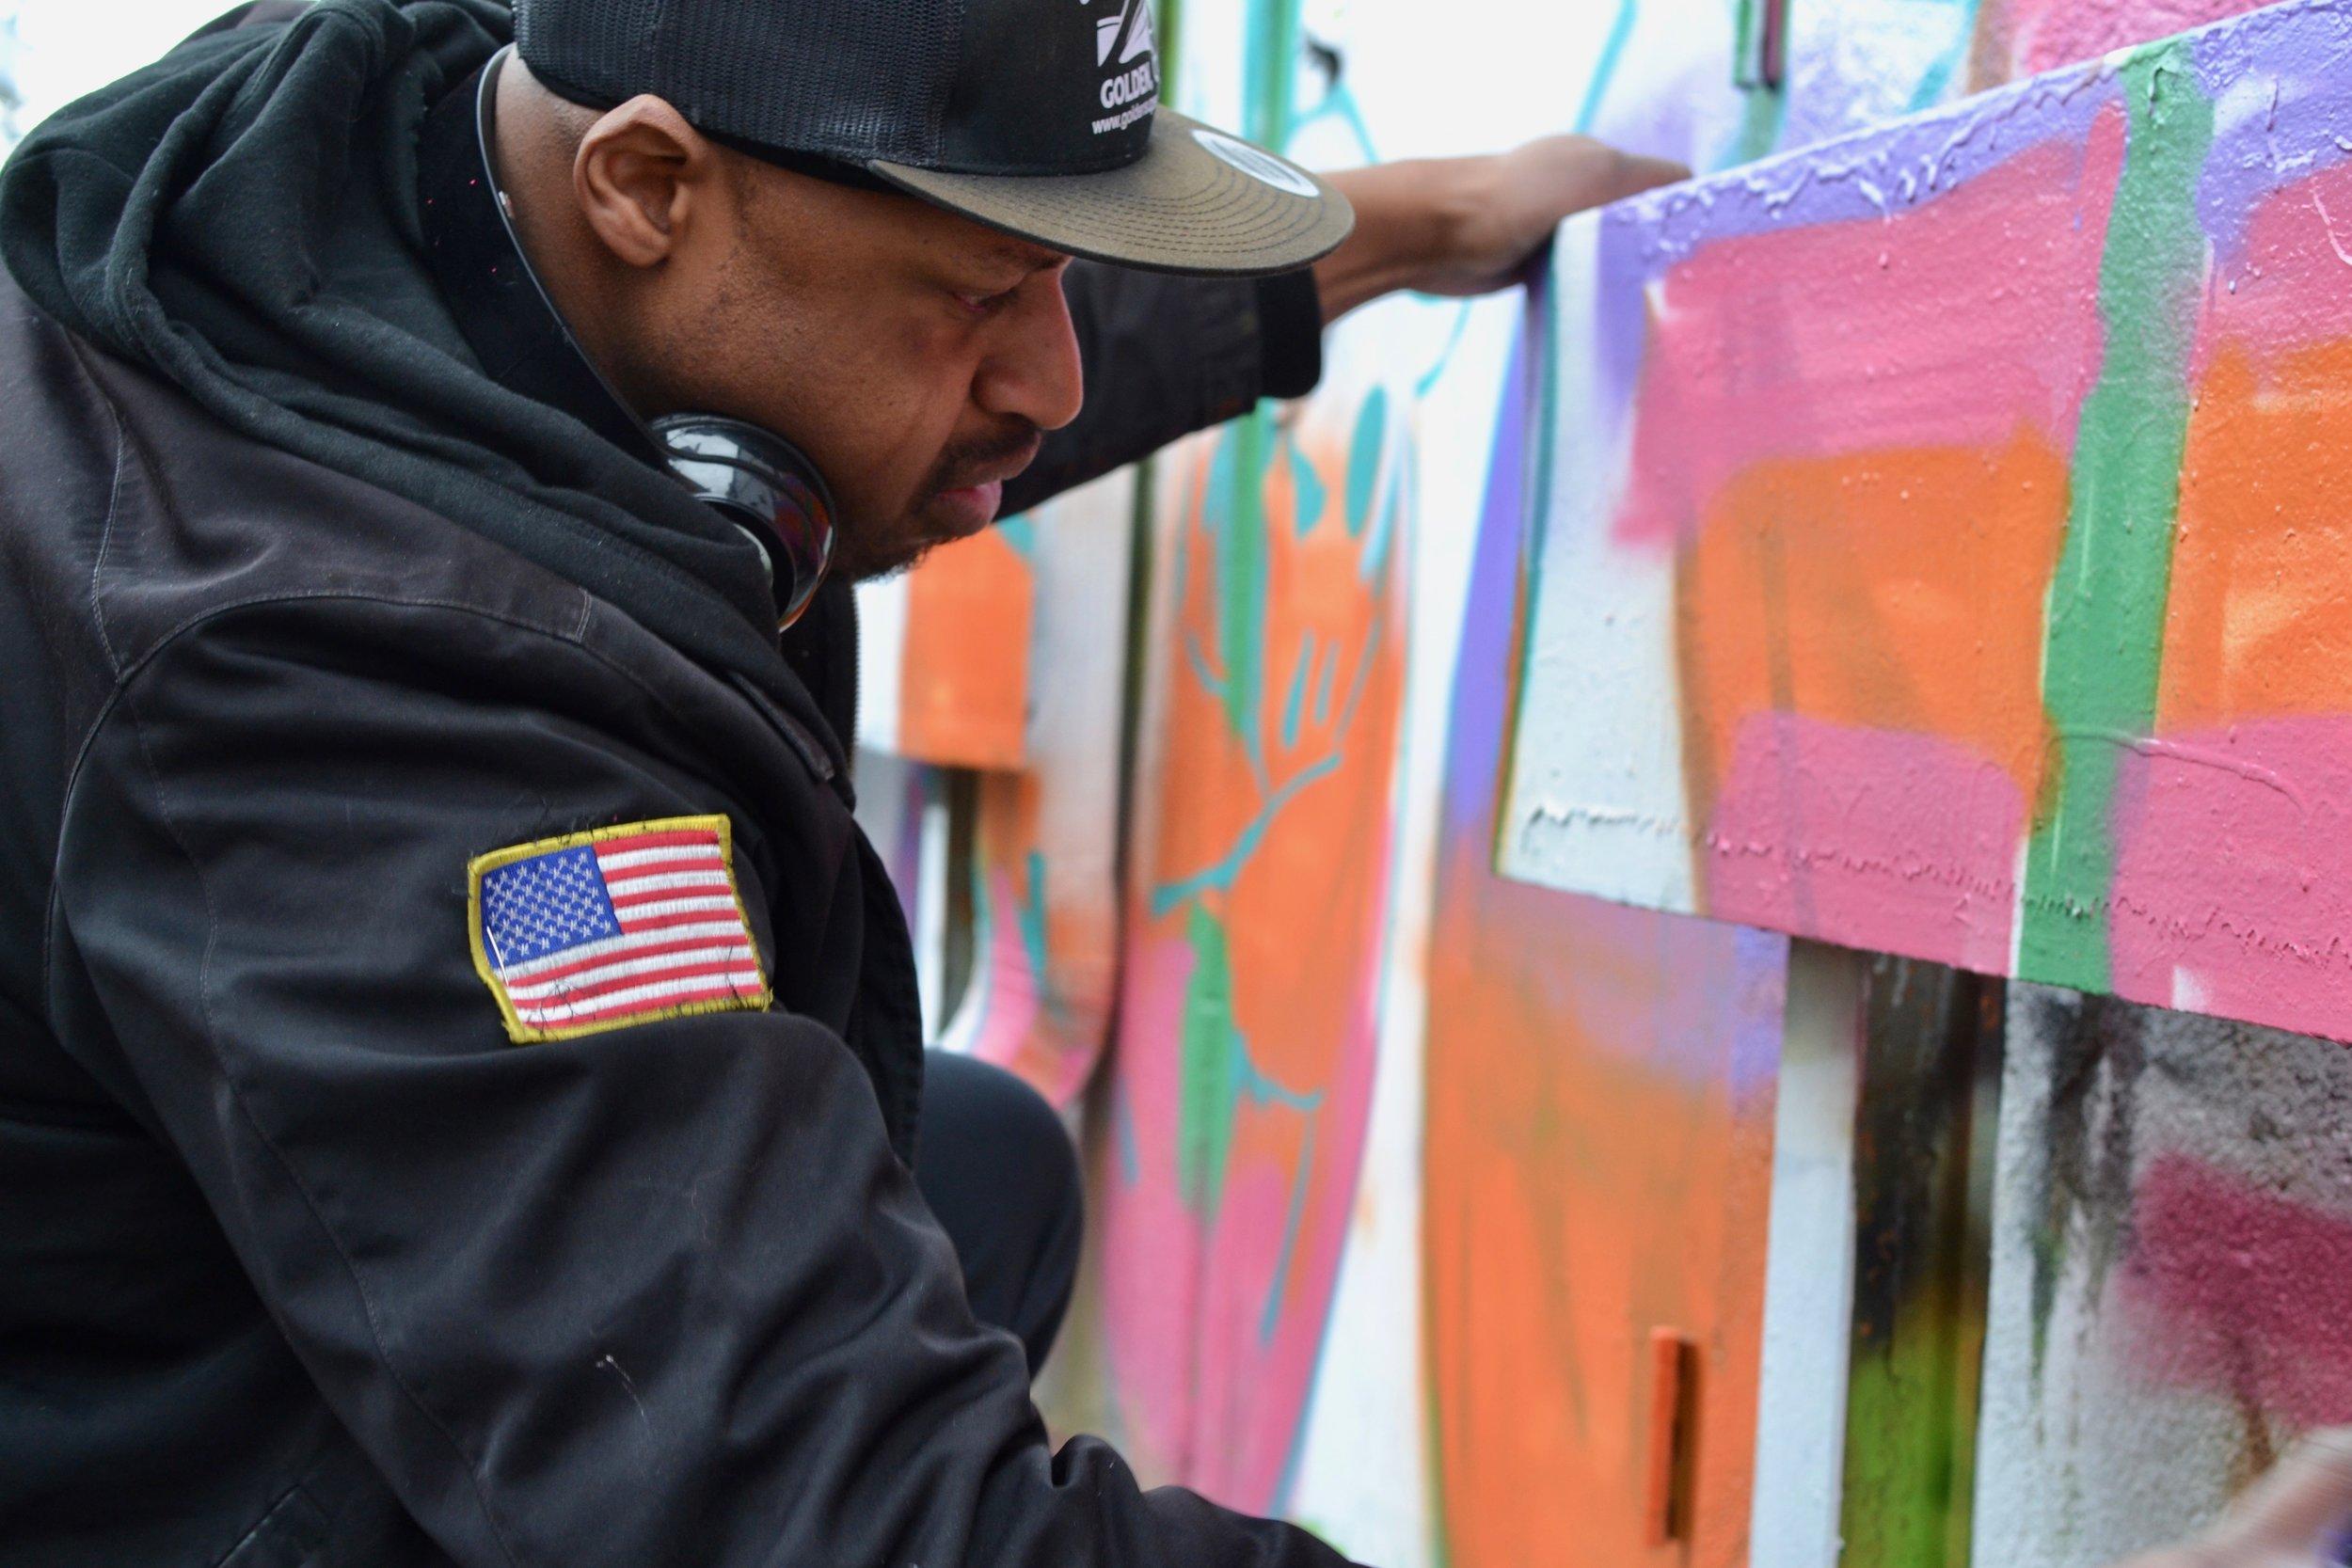 Robert Wright for Stain'd Arts' interview with artist series, denver muralist